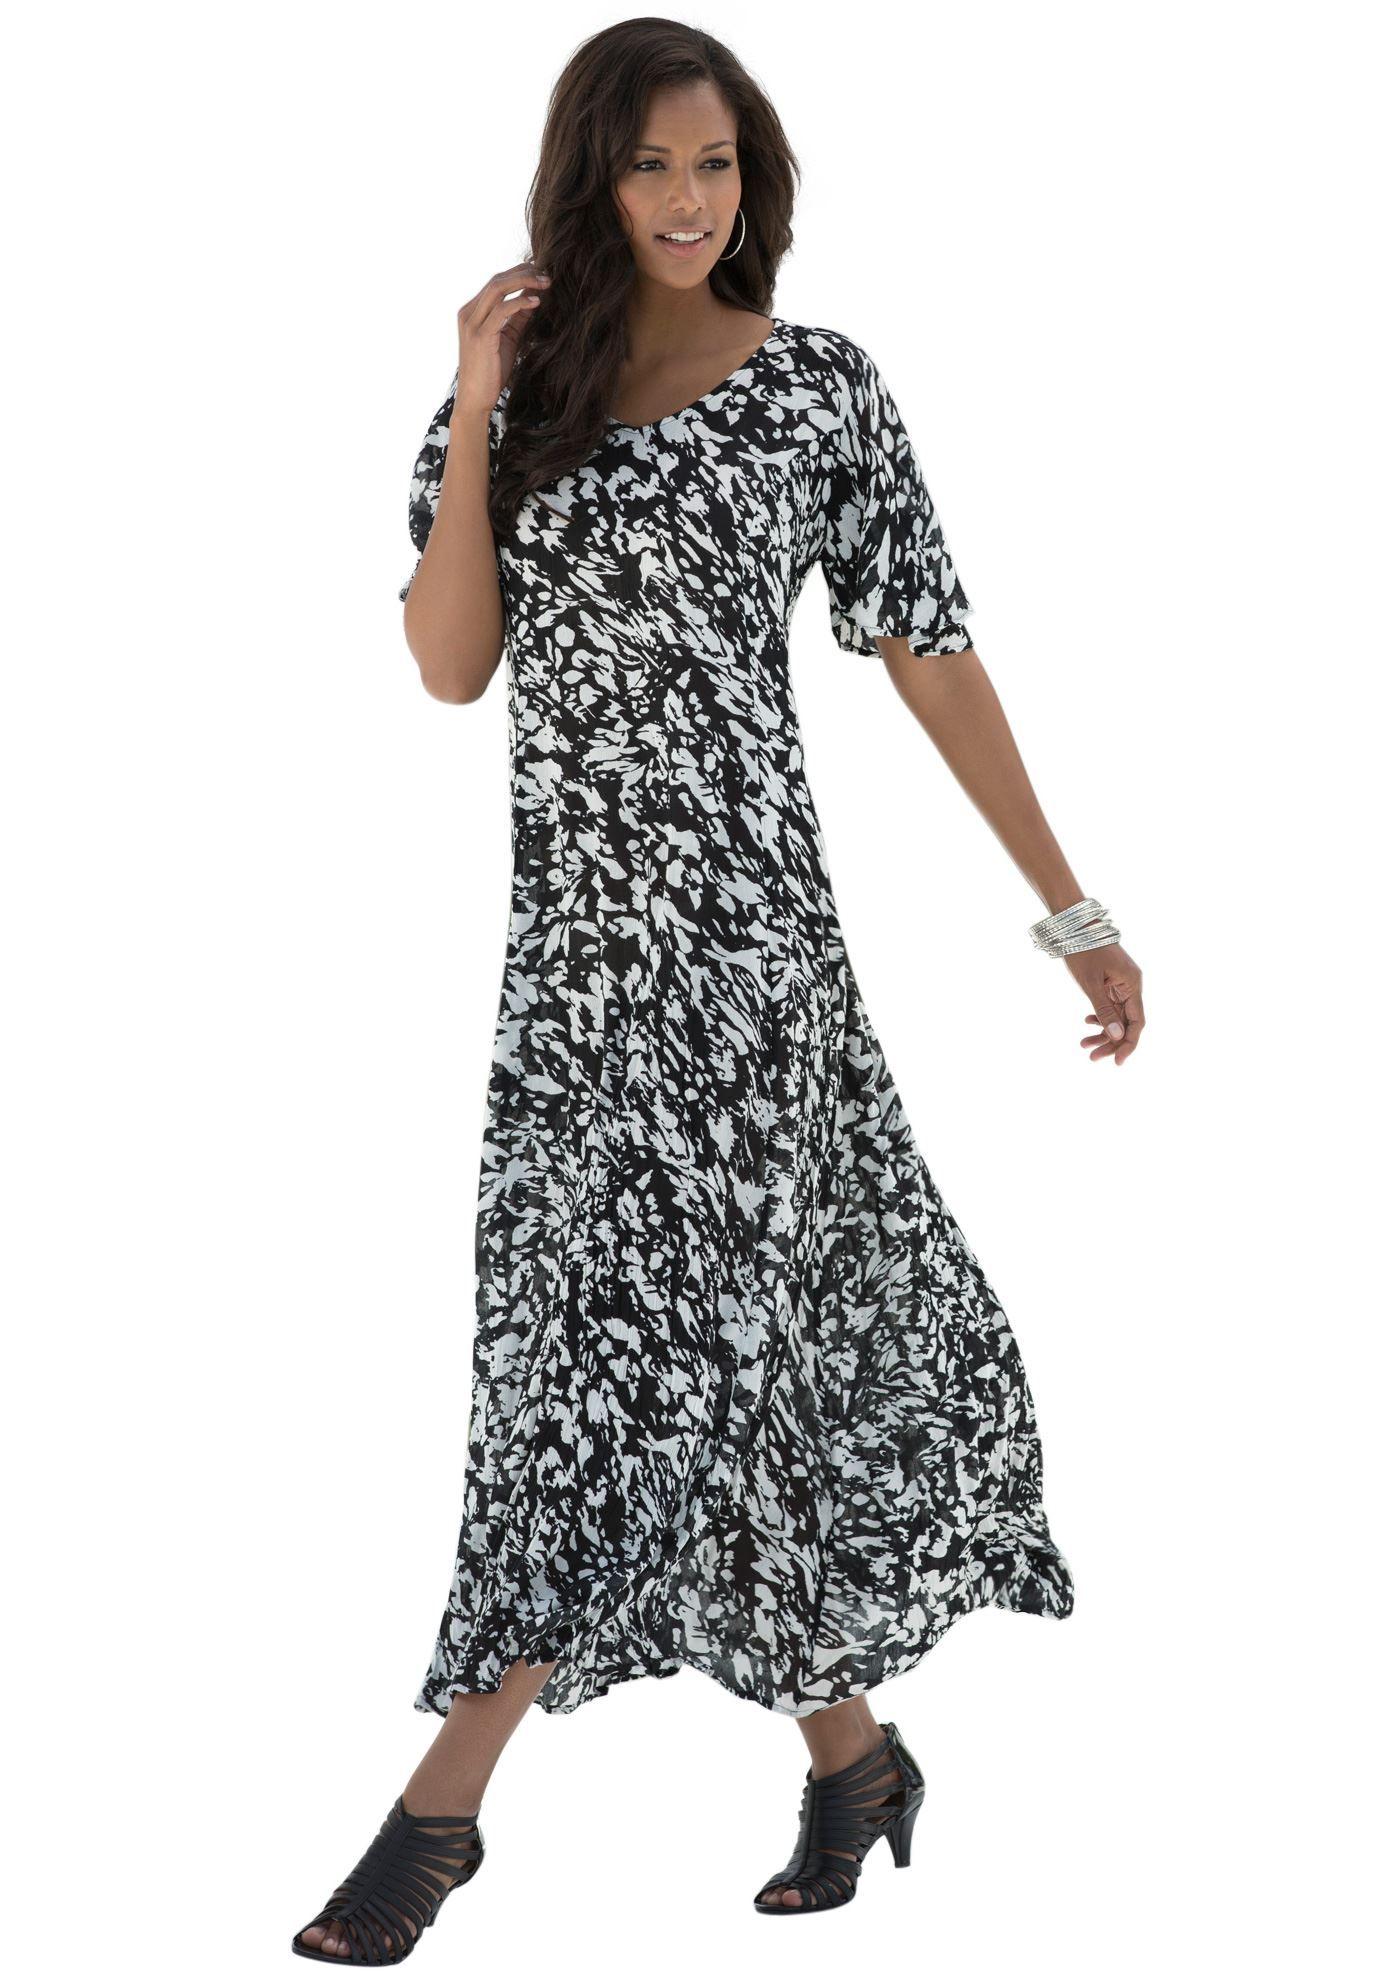 Crinkle Short Sleeve Maxi Dress Maxi Dress Plus Size Maxi Dresses Short Sleeve Maxi Dresses [ 1986 x 1380 Pixel ]